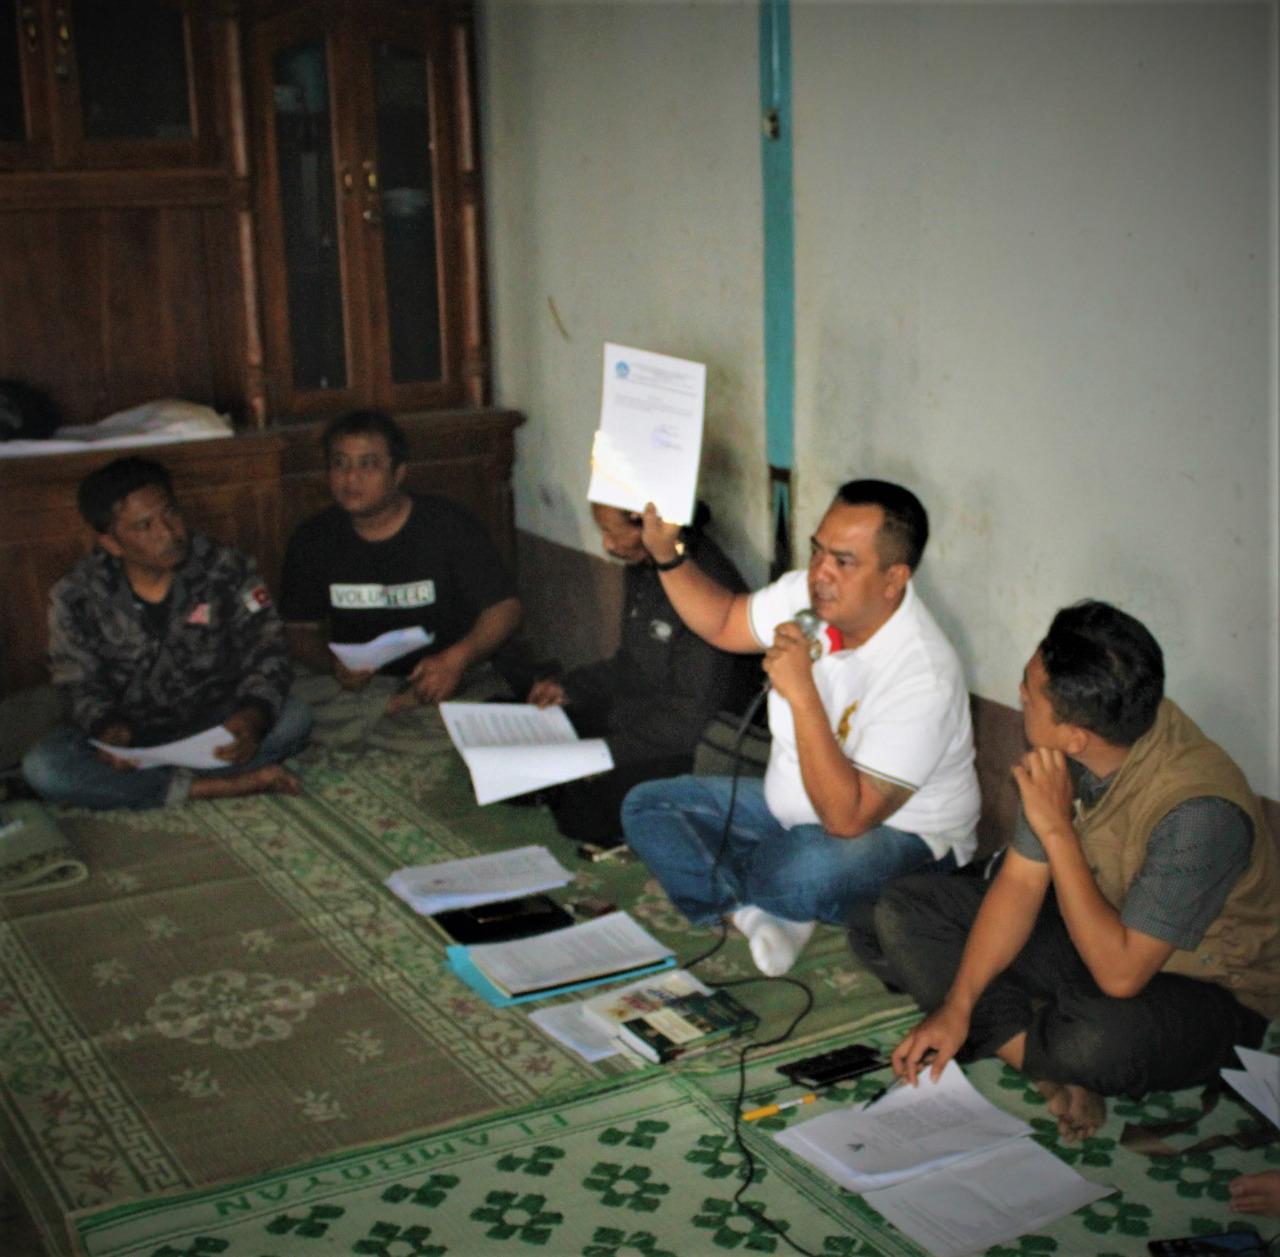 Keterangan foto: BRM.Kusuma Putra, SH,M.H tengah menunjukan surat pendaftaran ke BPCB.